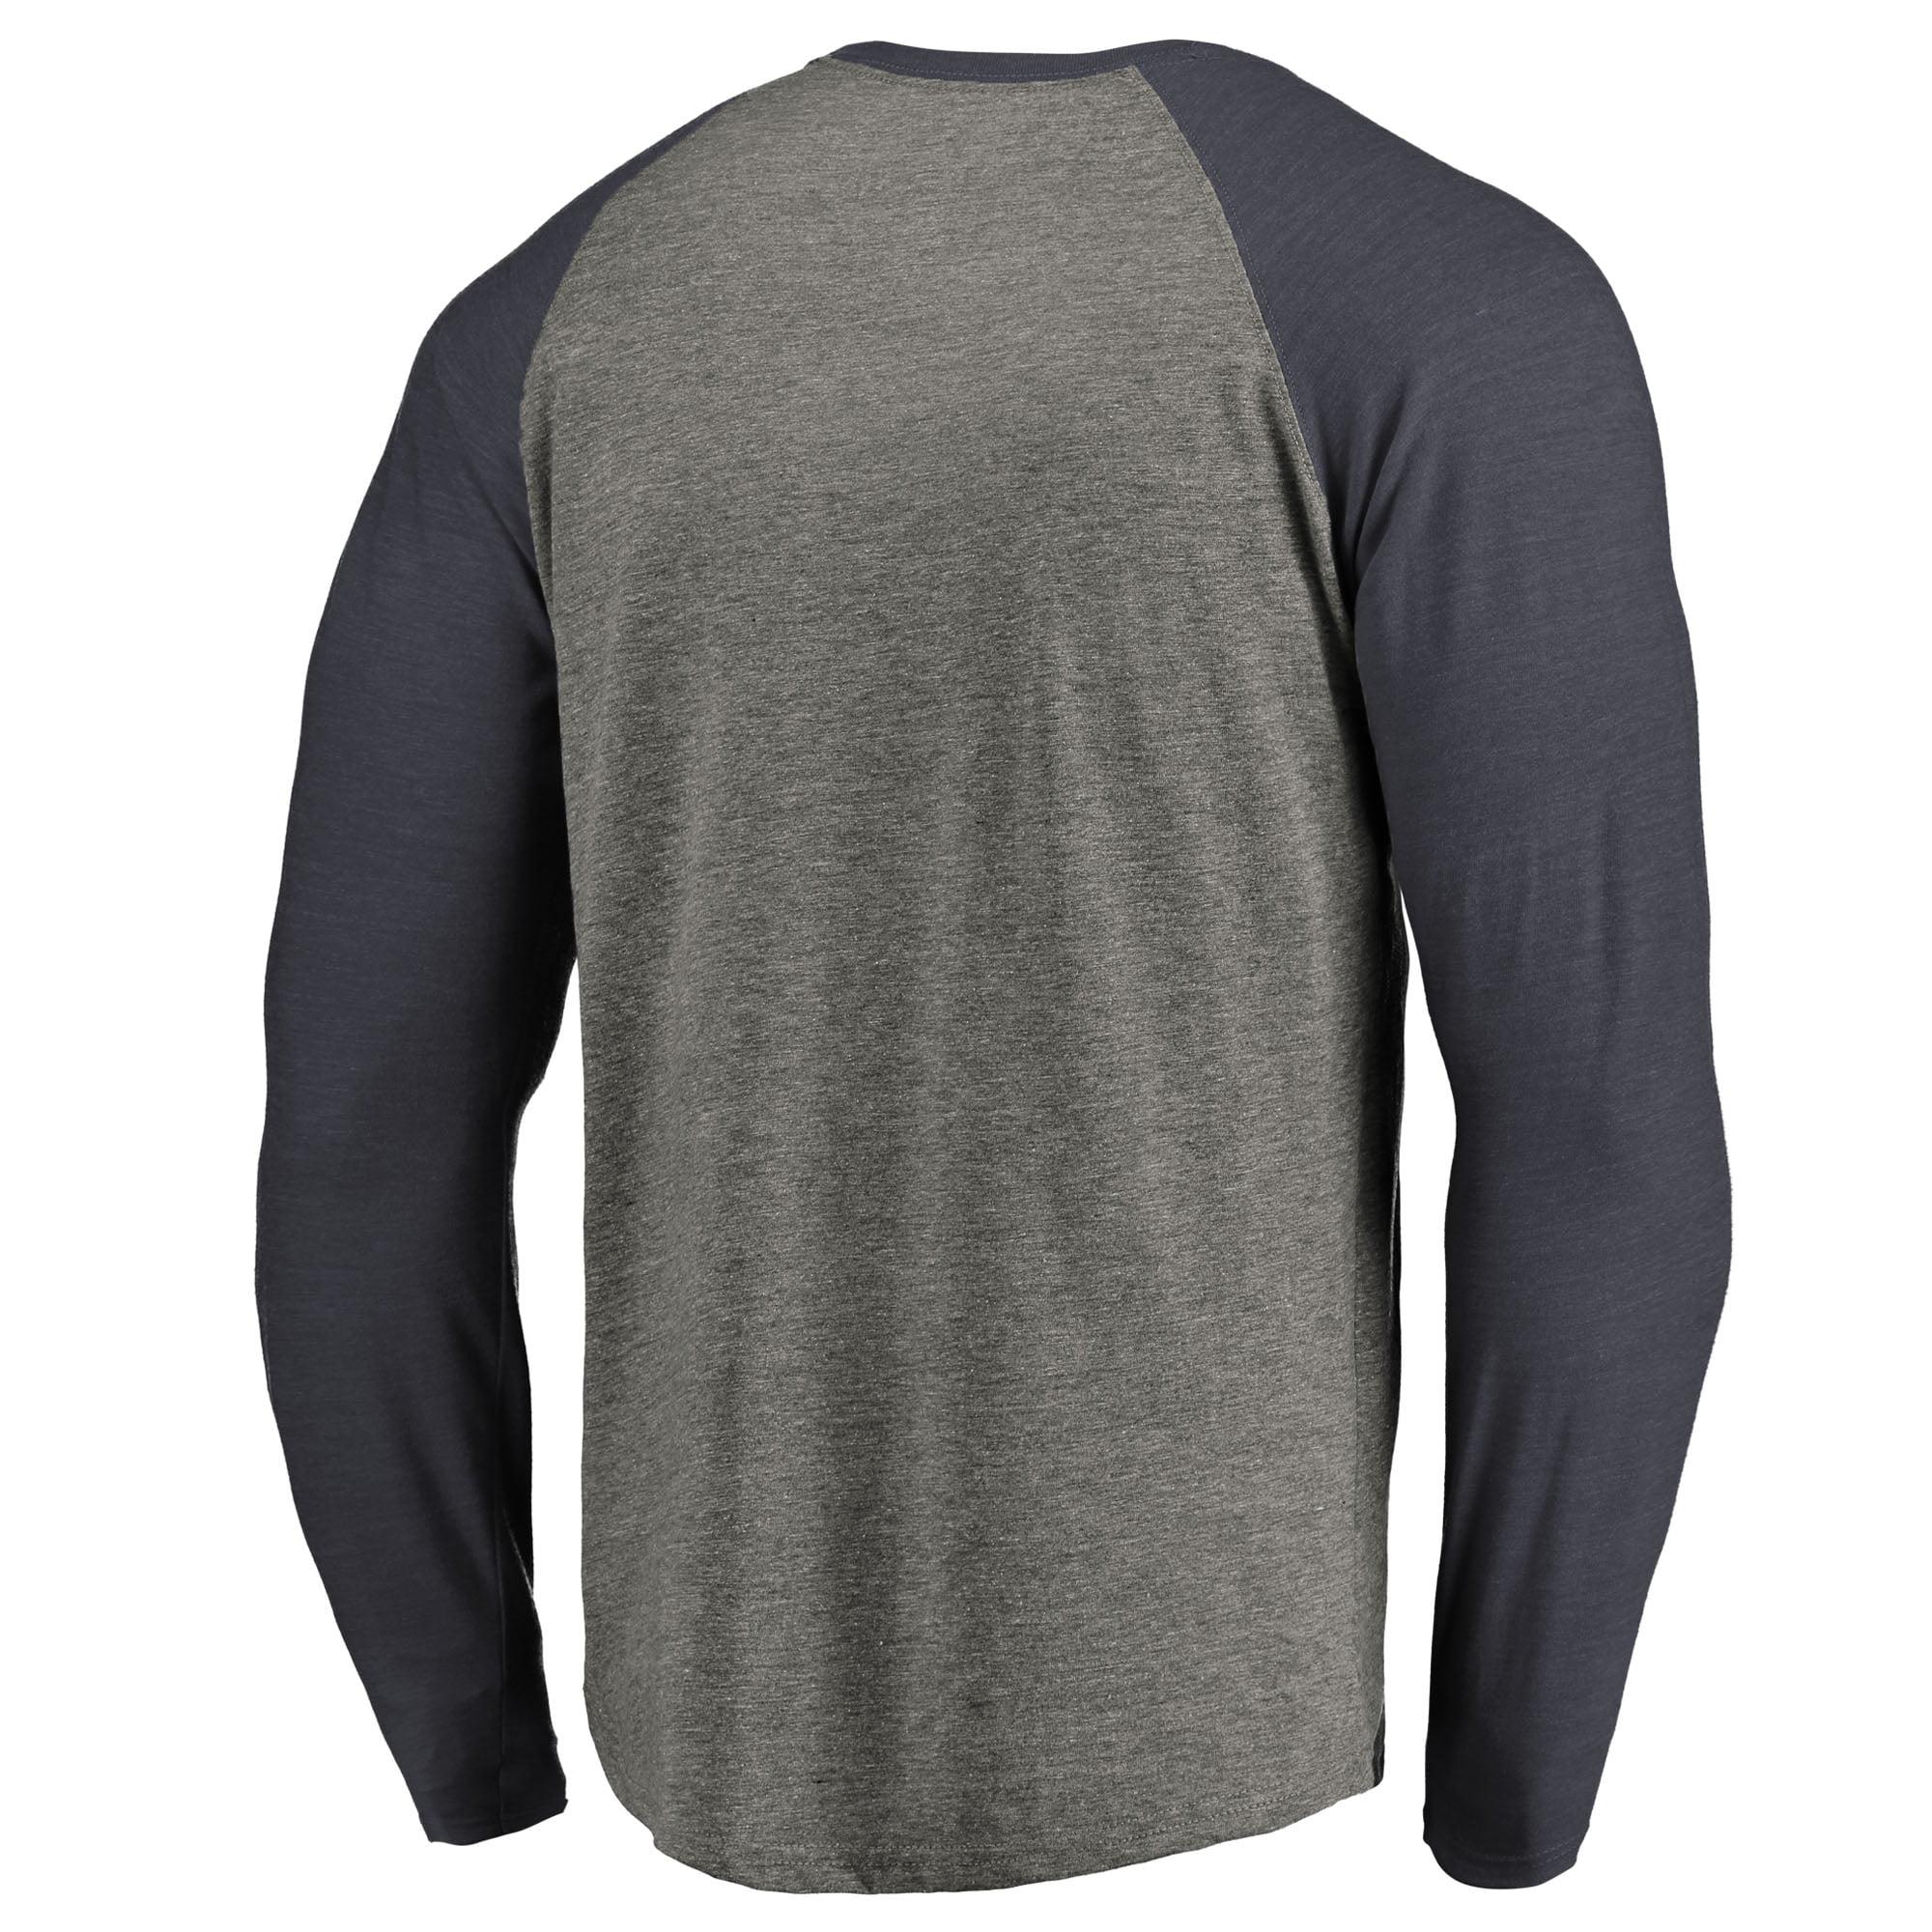 fdcf14a68 Cleveland Cavaliers Fanatics Branded Team Wordmark Long Sleeve Raglan  Tri-Blend T-Shirt - Heathered Gray - Walmart.com